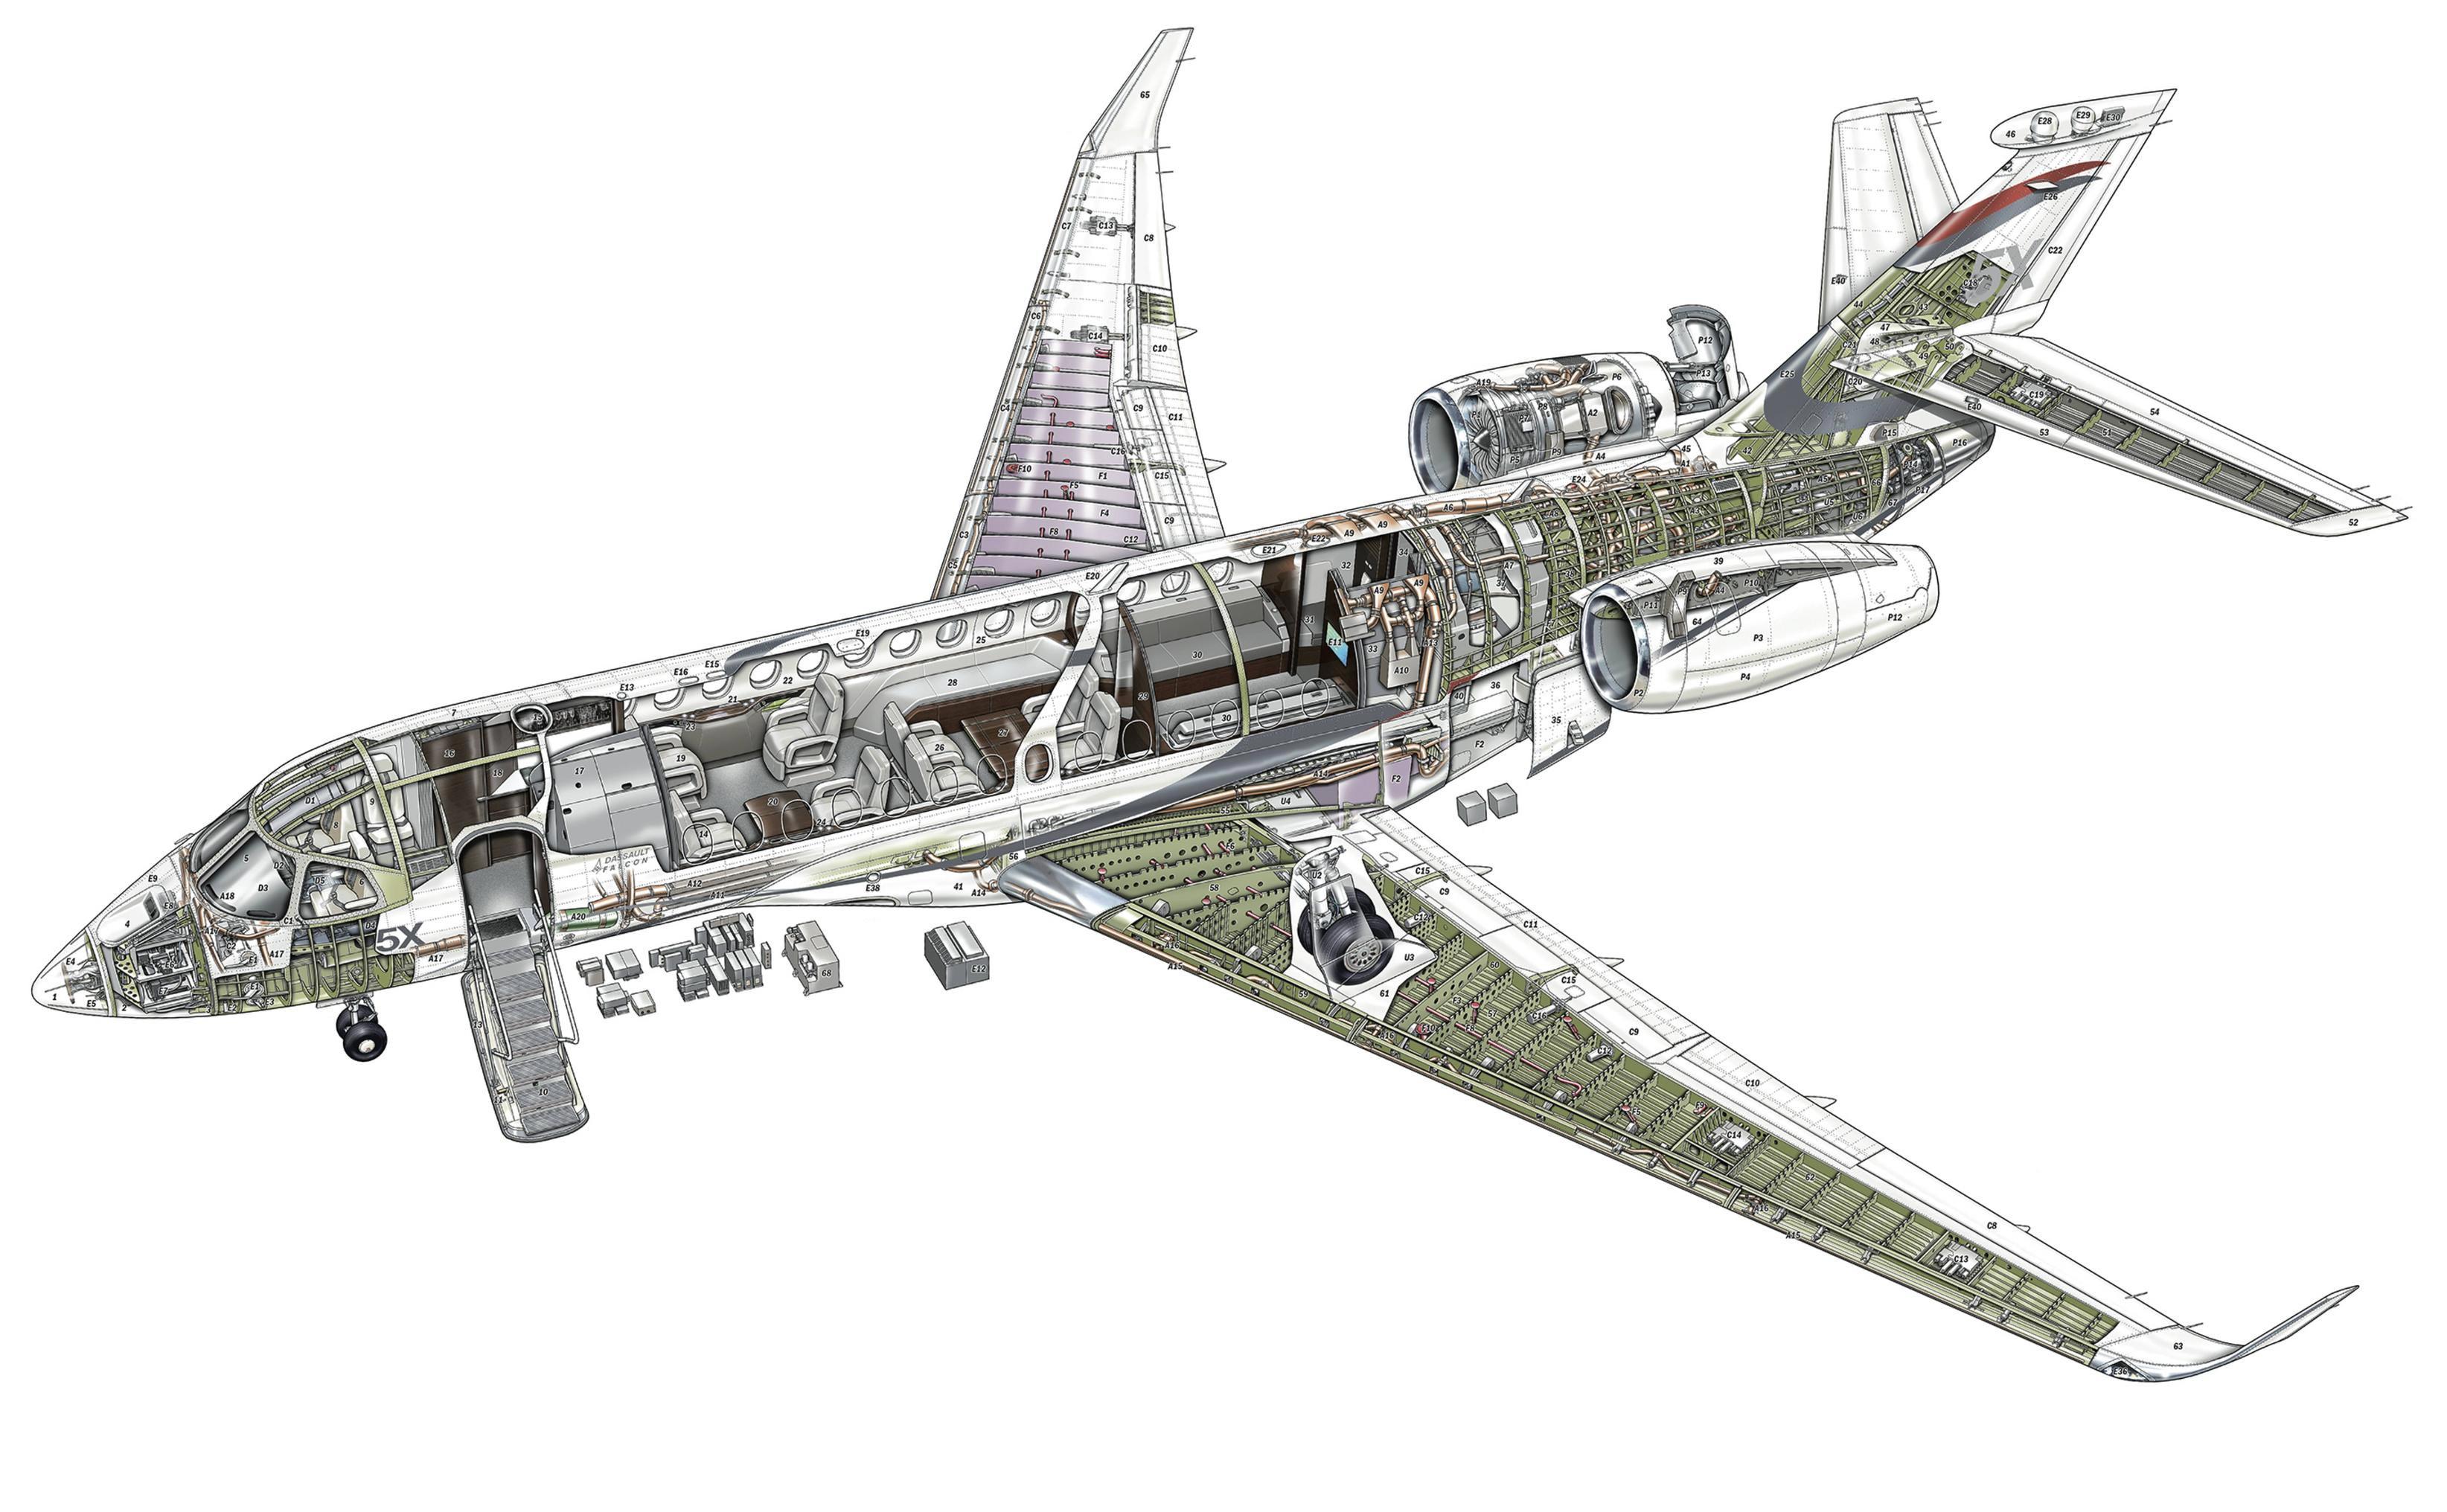 Dassault Falcon 5X cutaway